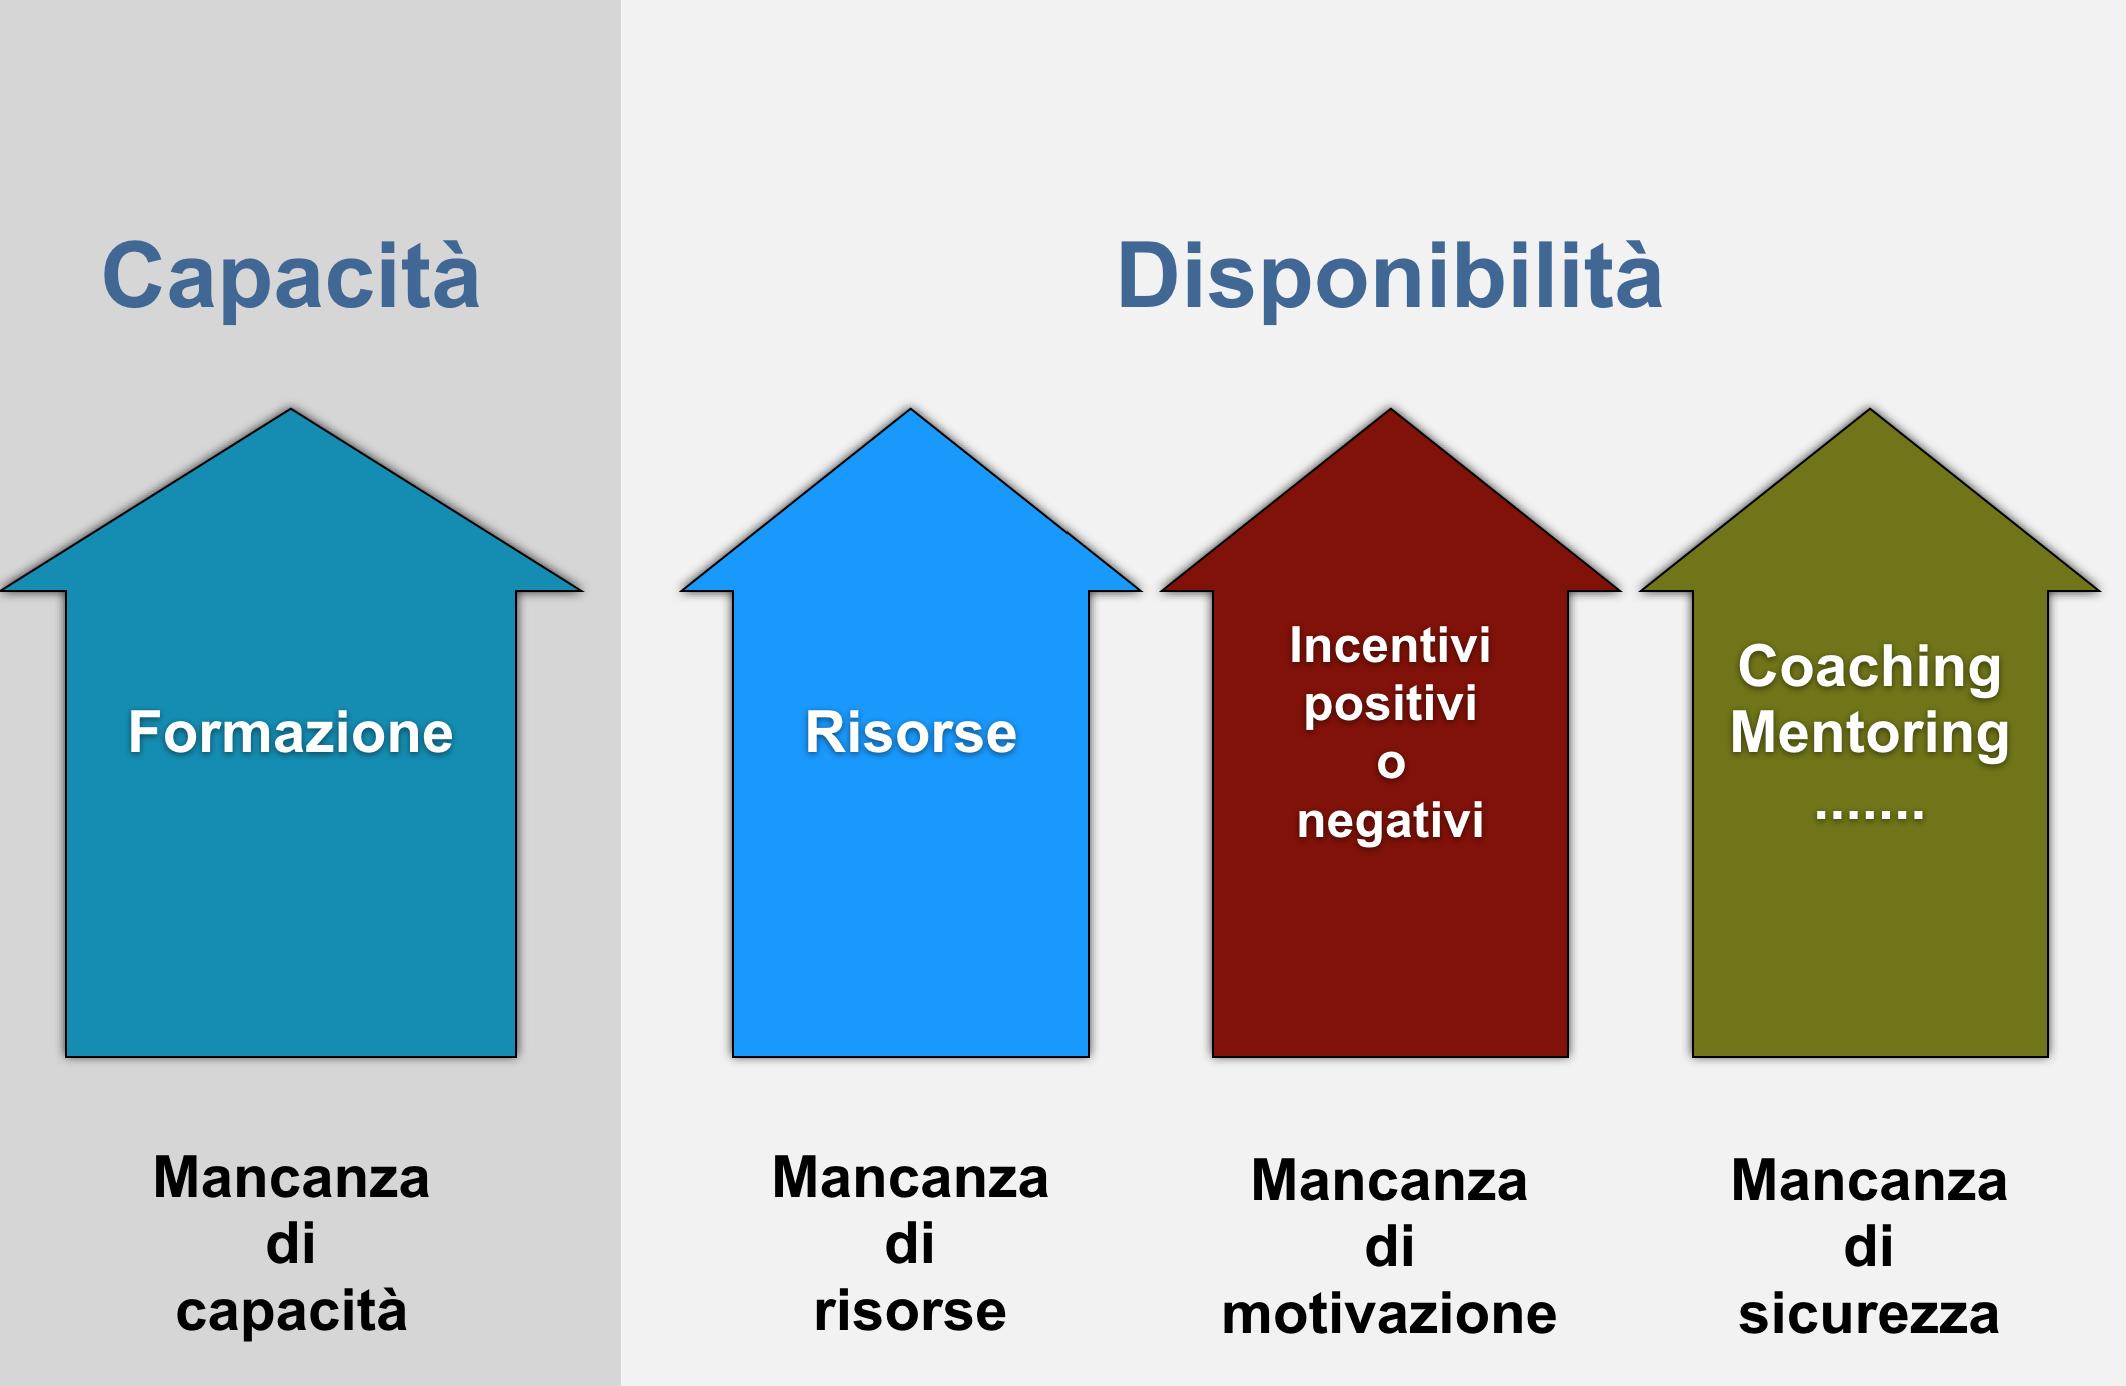 3-1-Autonomia